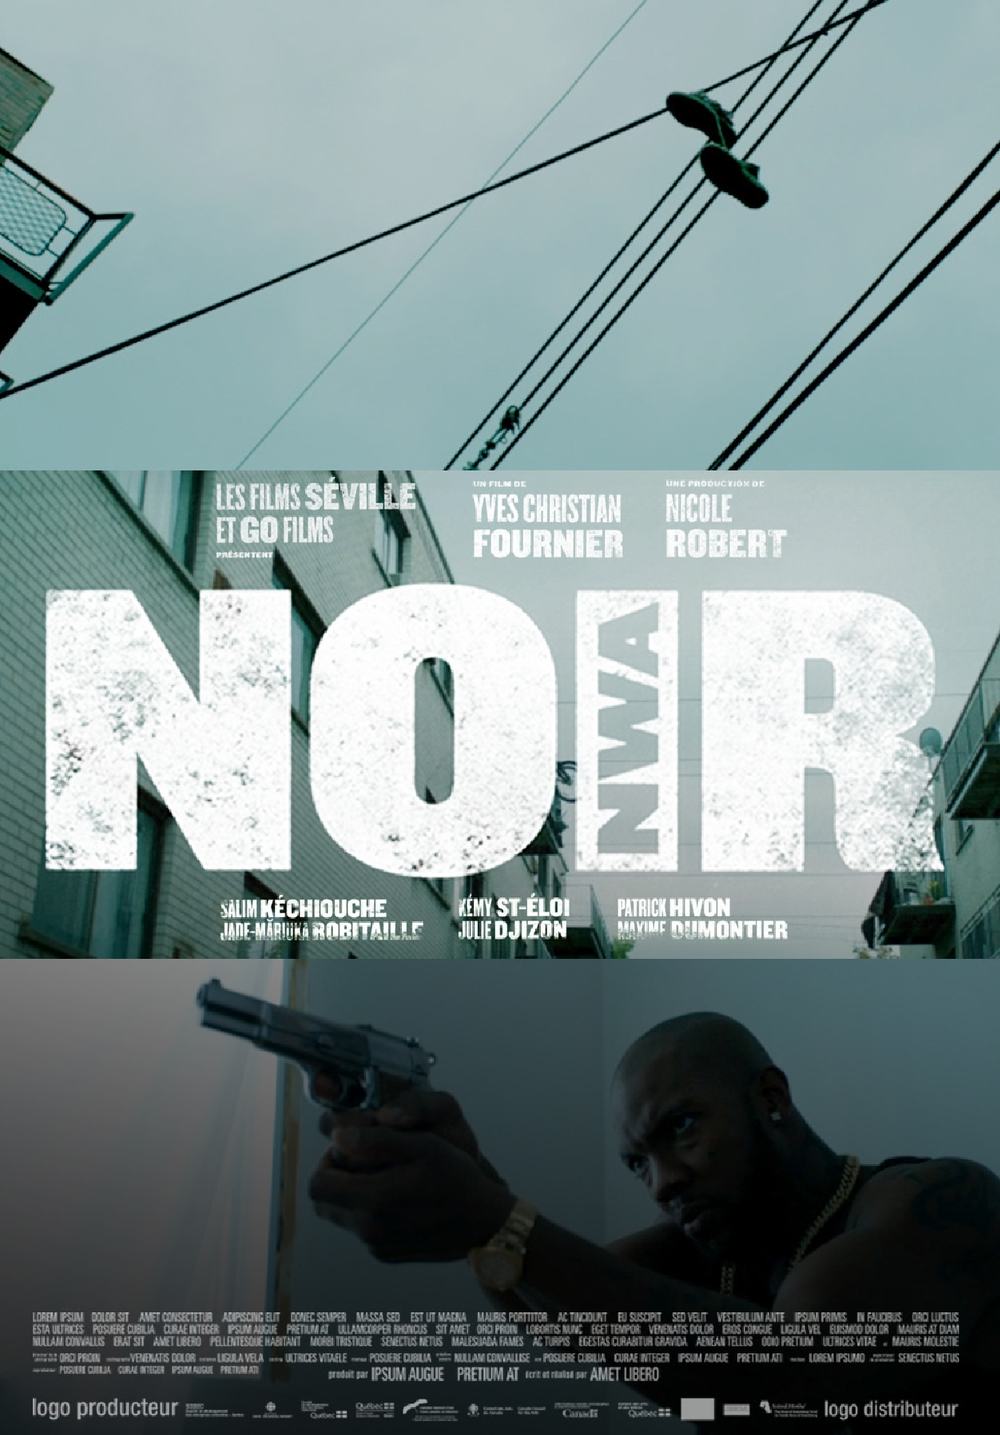 NOIR-Poster-RENZO-13oct-1_00001.jpg